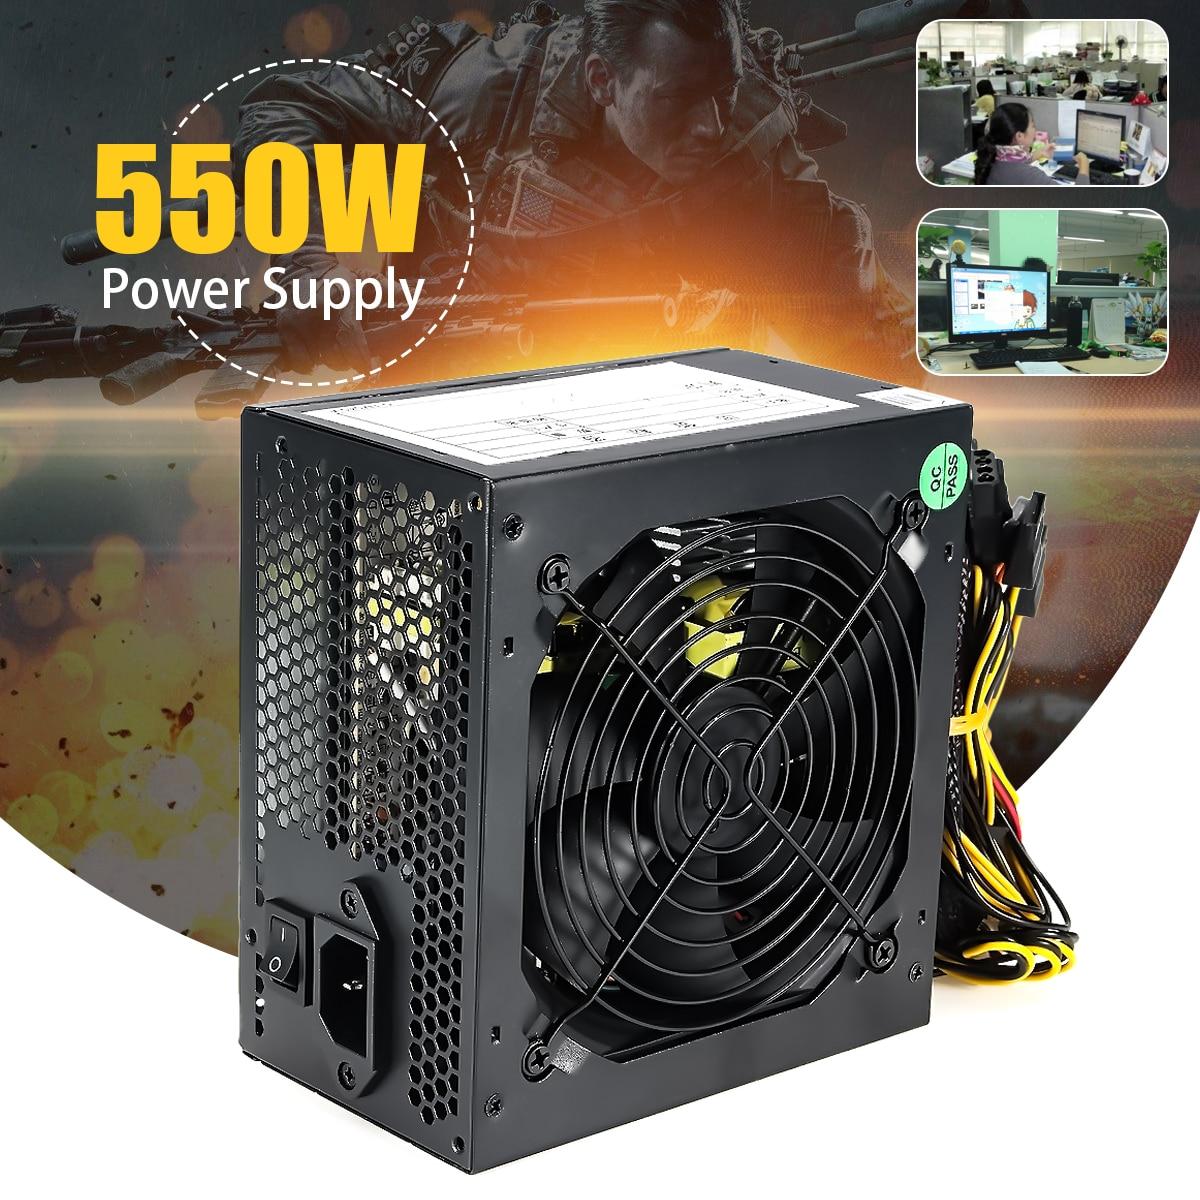 550W Peak- PC PSU Power Supply Black Gaming 120mm Fan Blue LED 20/24pin 12V ATX High Quality Computer Power Supply For BTC